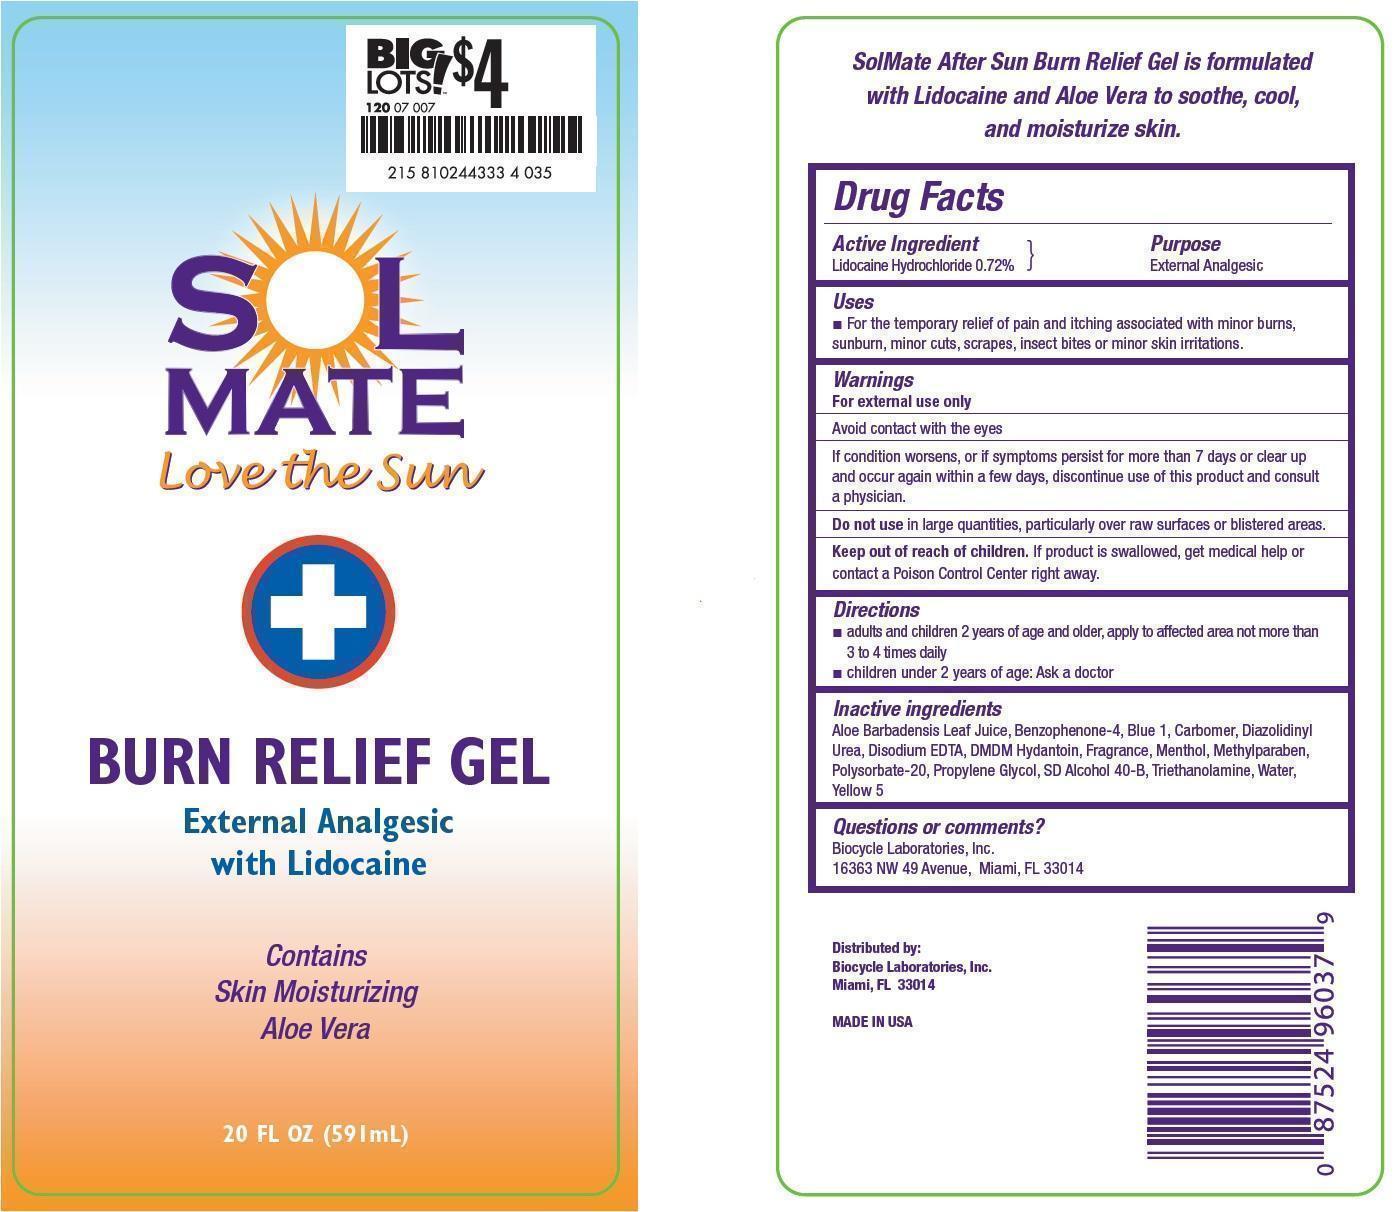 Solmate Burn Relief Gel (Lidocaine Hydrochloride) Gel [Prime Enterprises, Inc.]